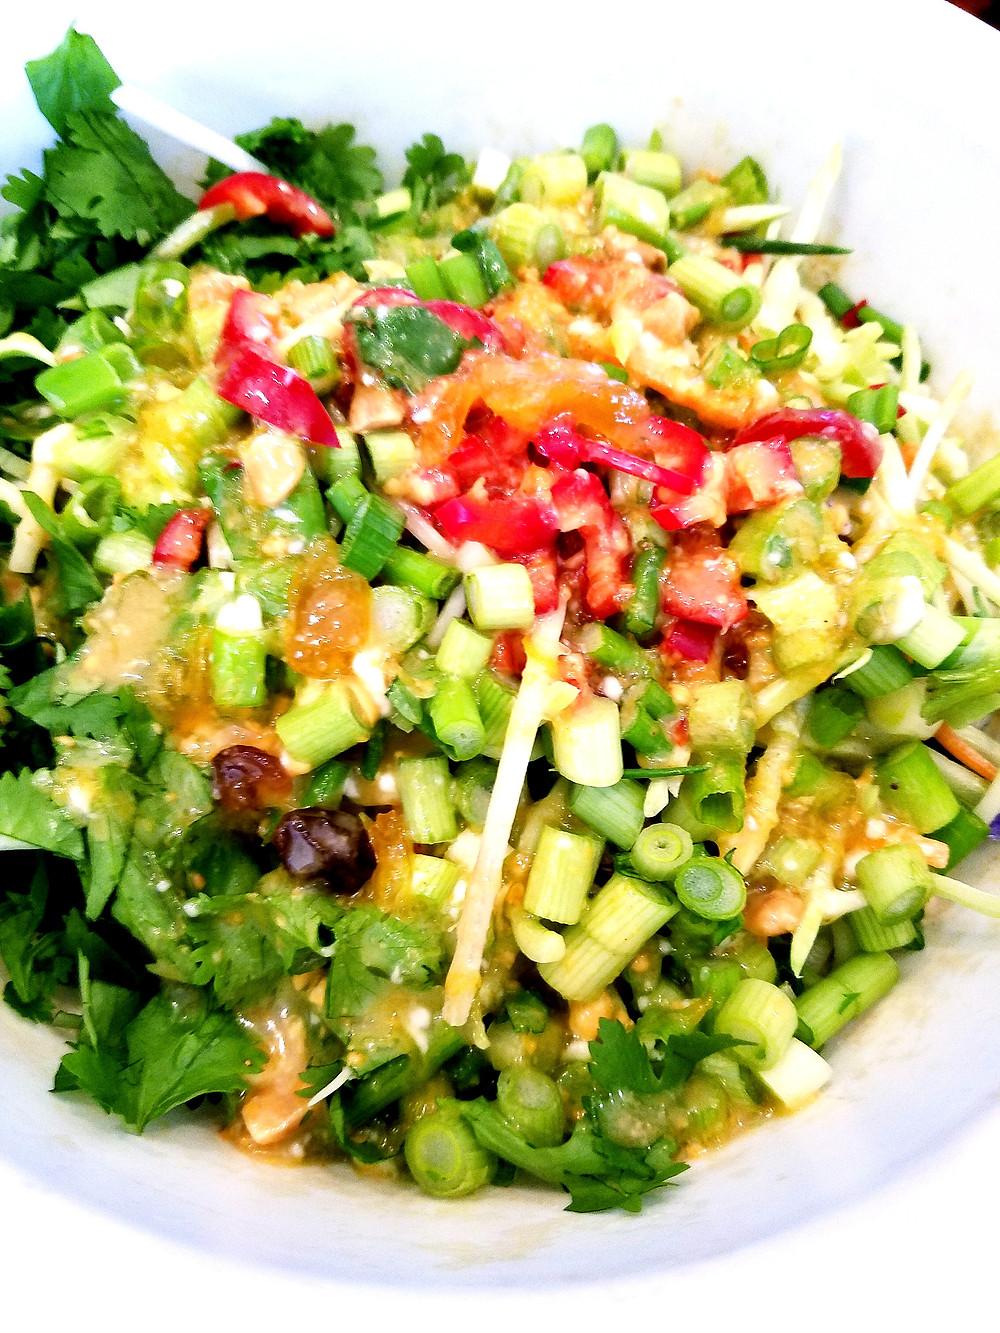 Spicy Broccoli Slaw (Gluten-Free, No soy or dairy)